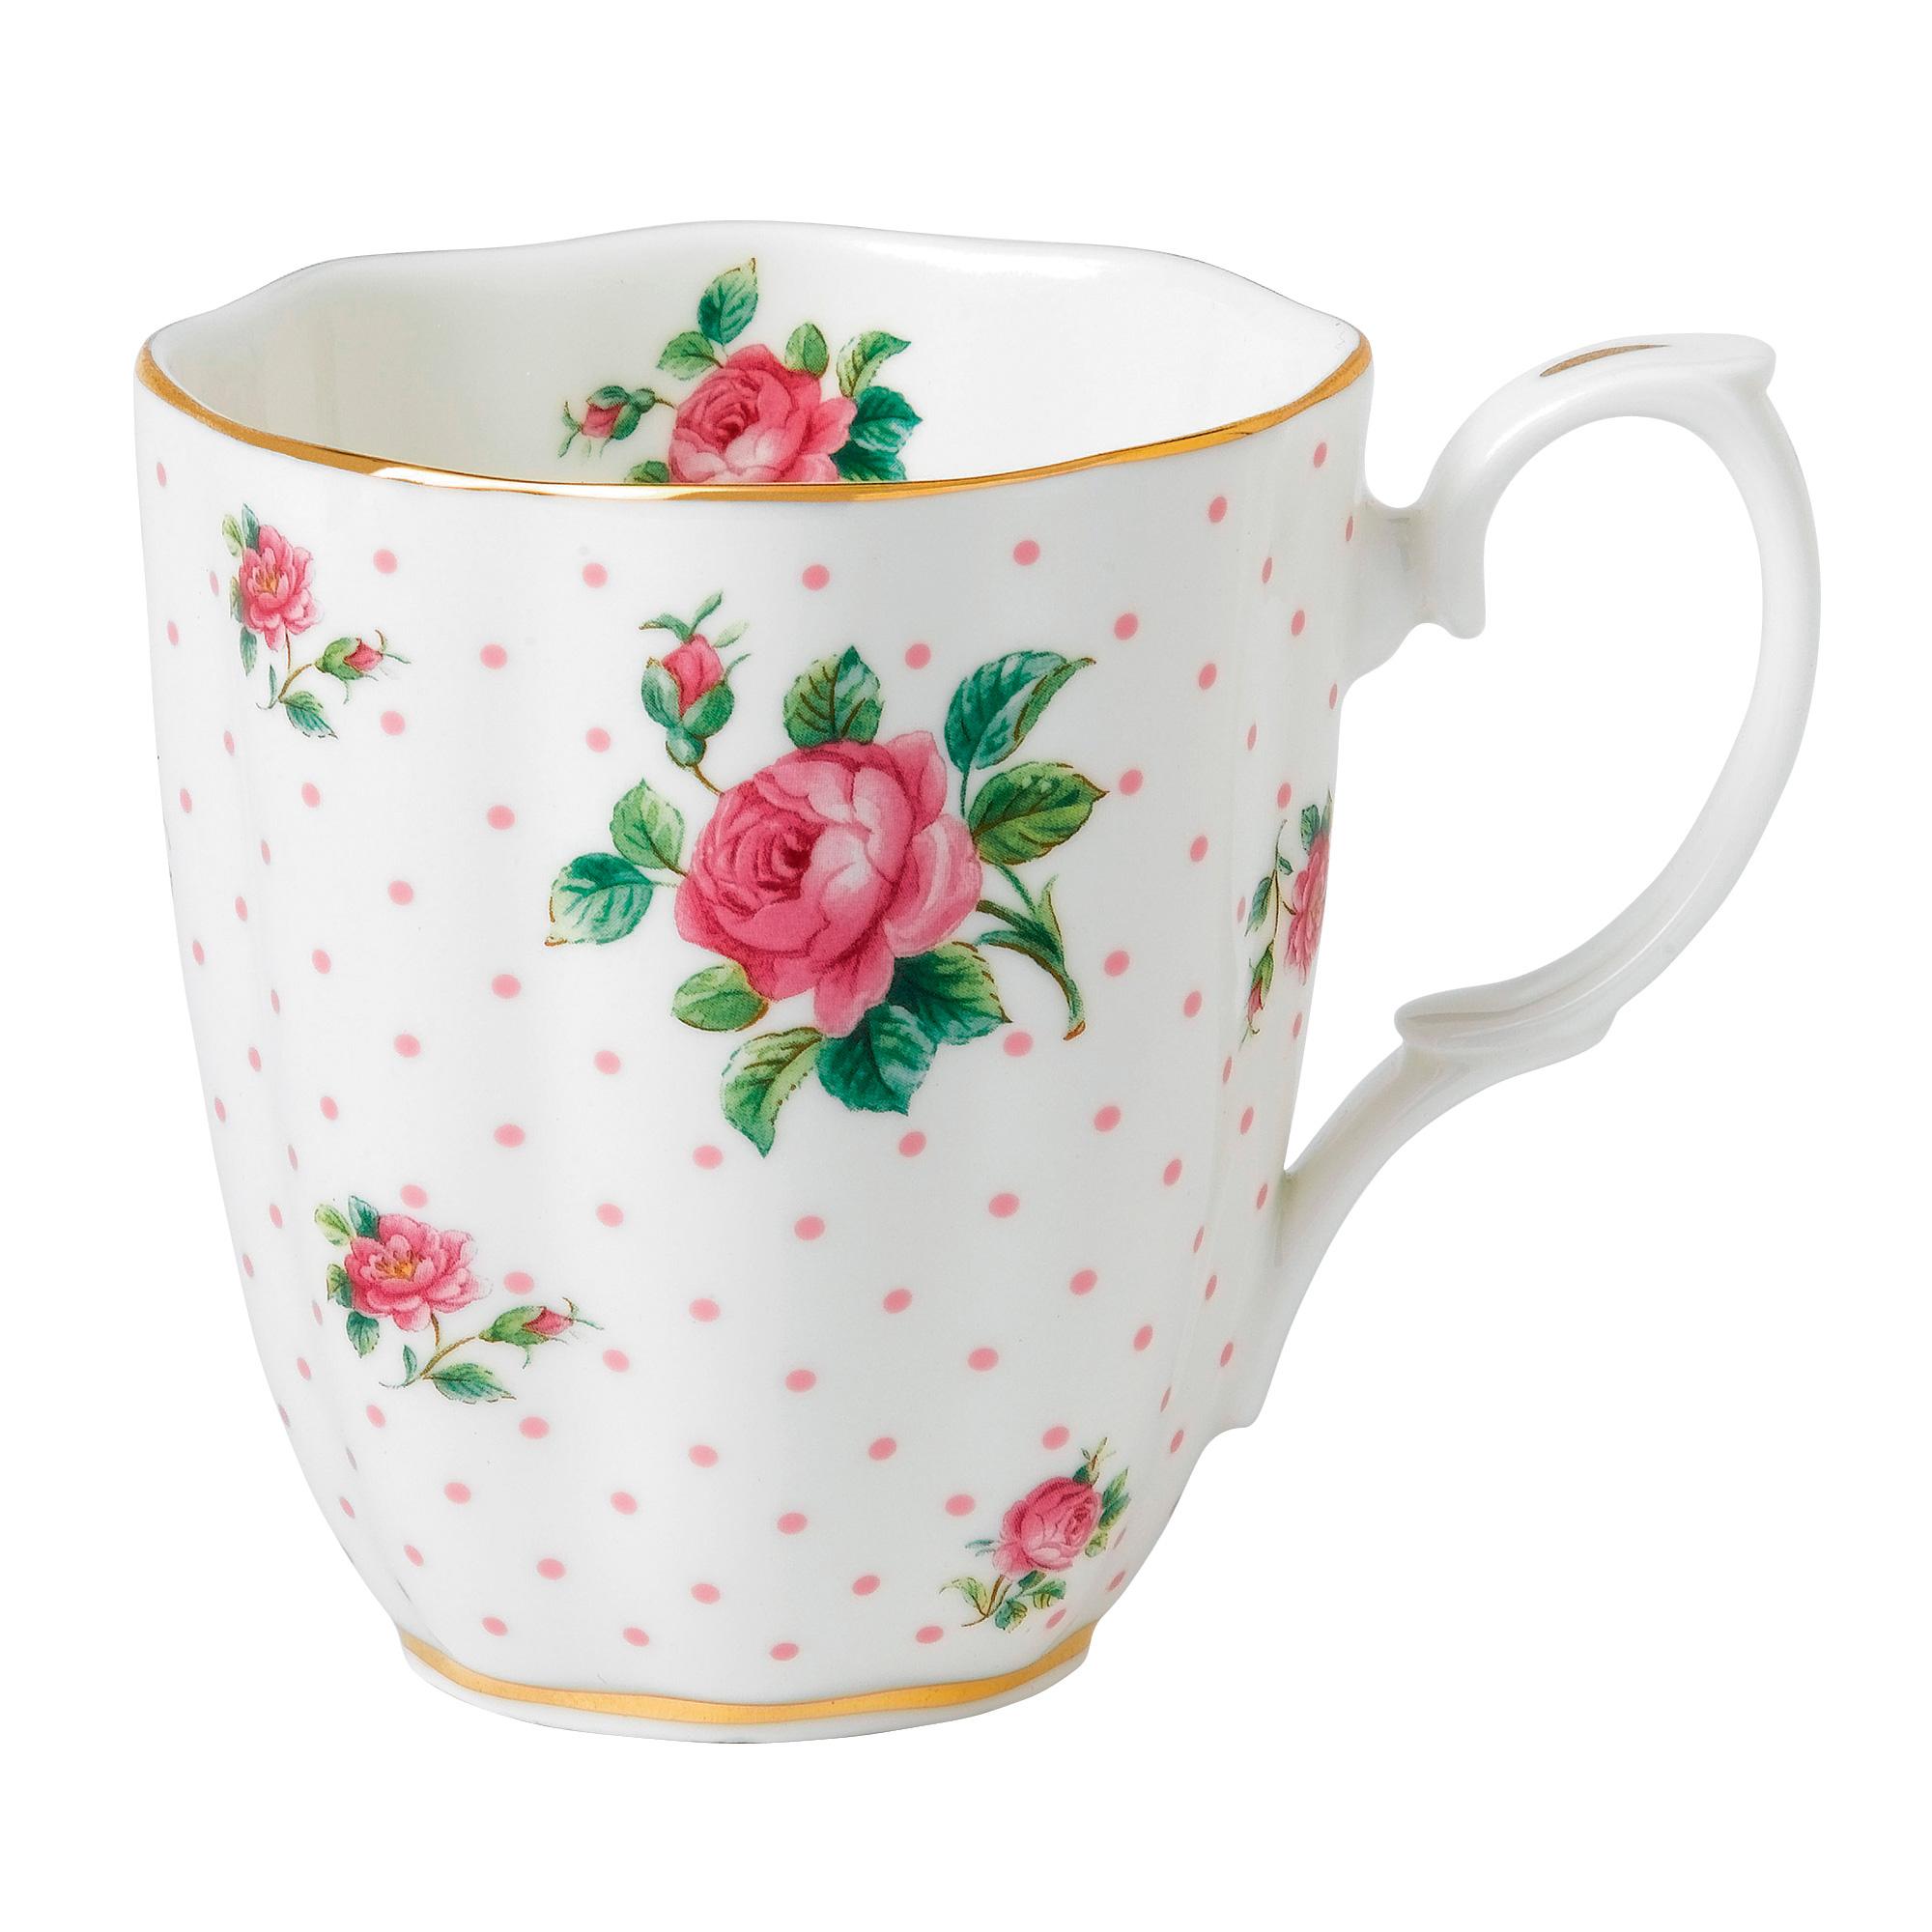 Vintage Mug (White with Pink Roses)